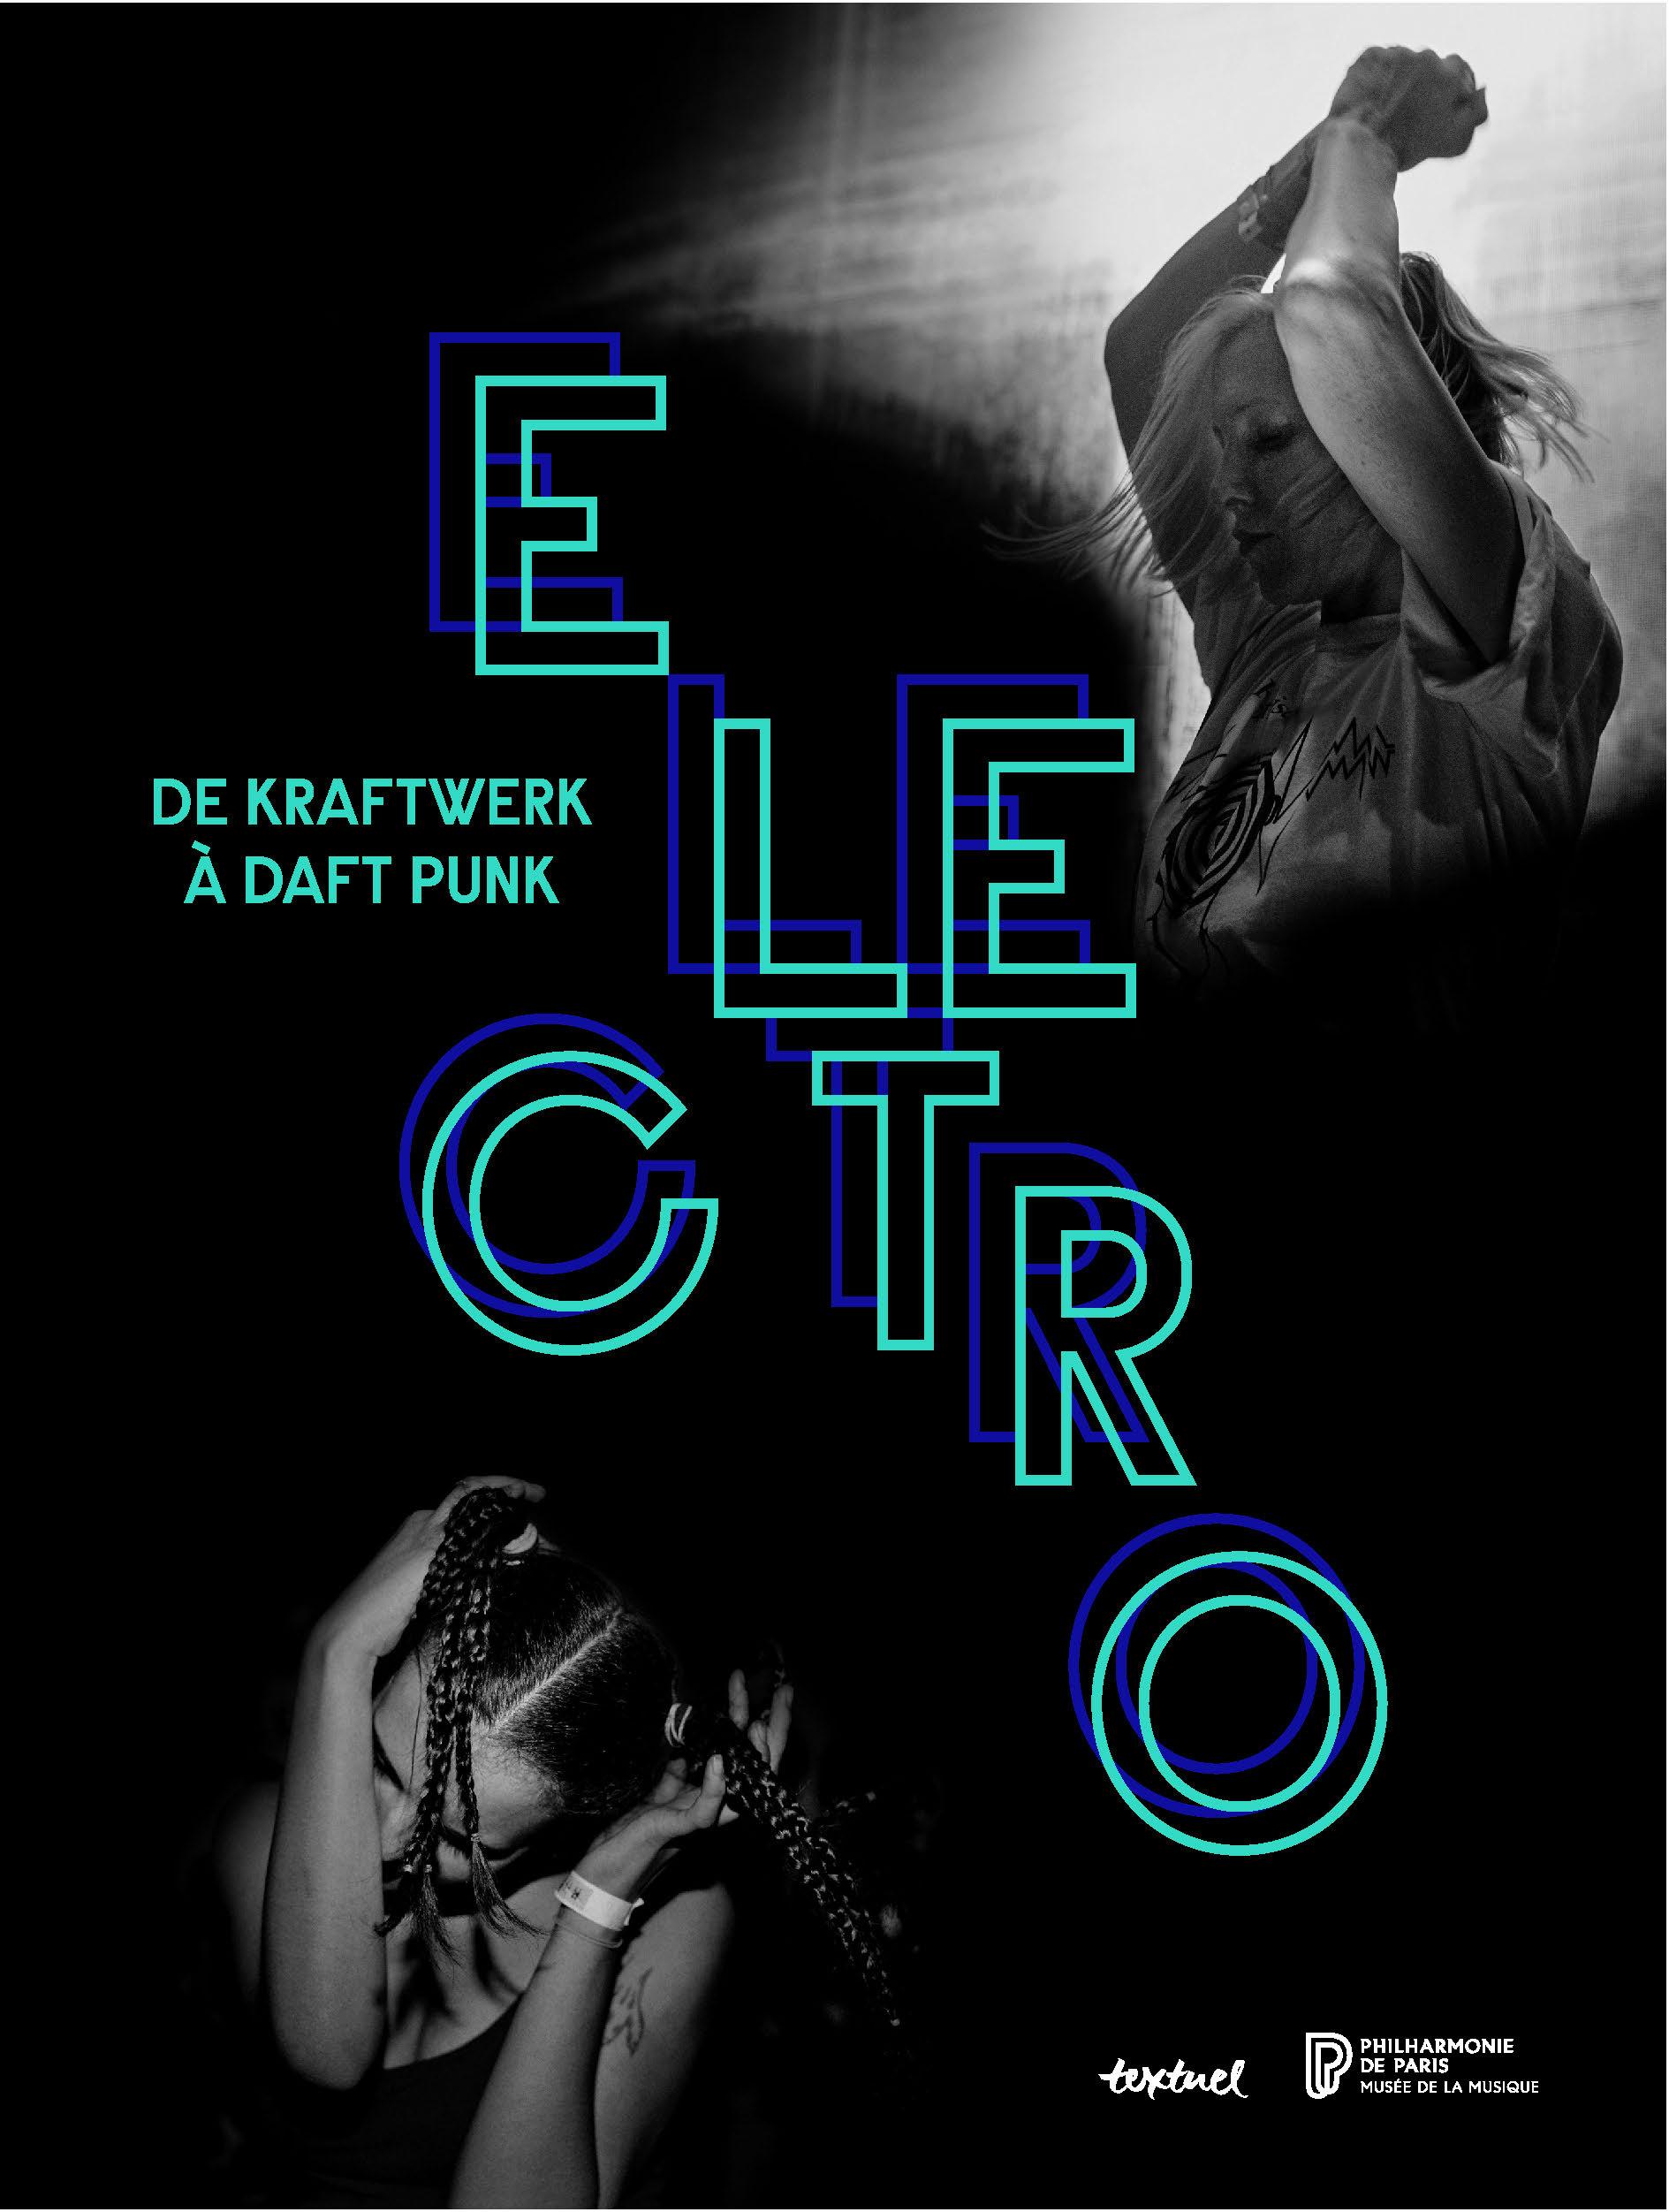 Electro, de Kraftwerk à Daft Punk